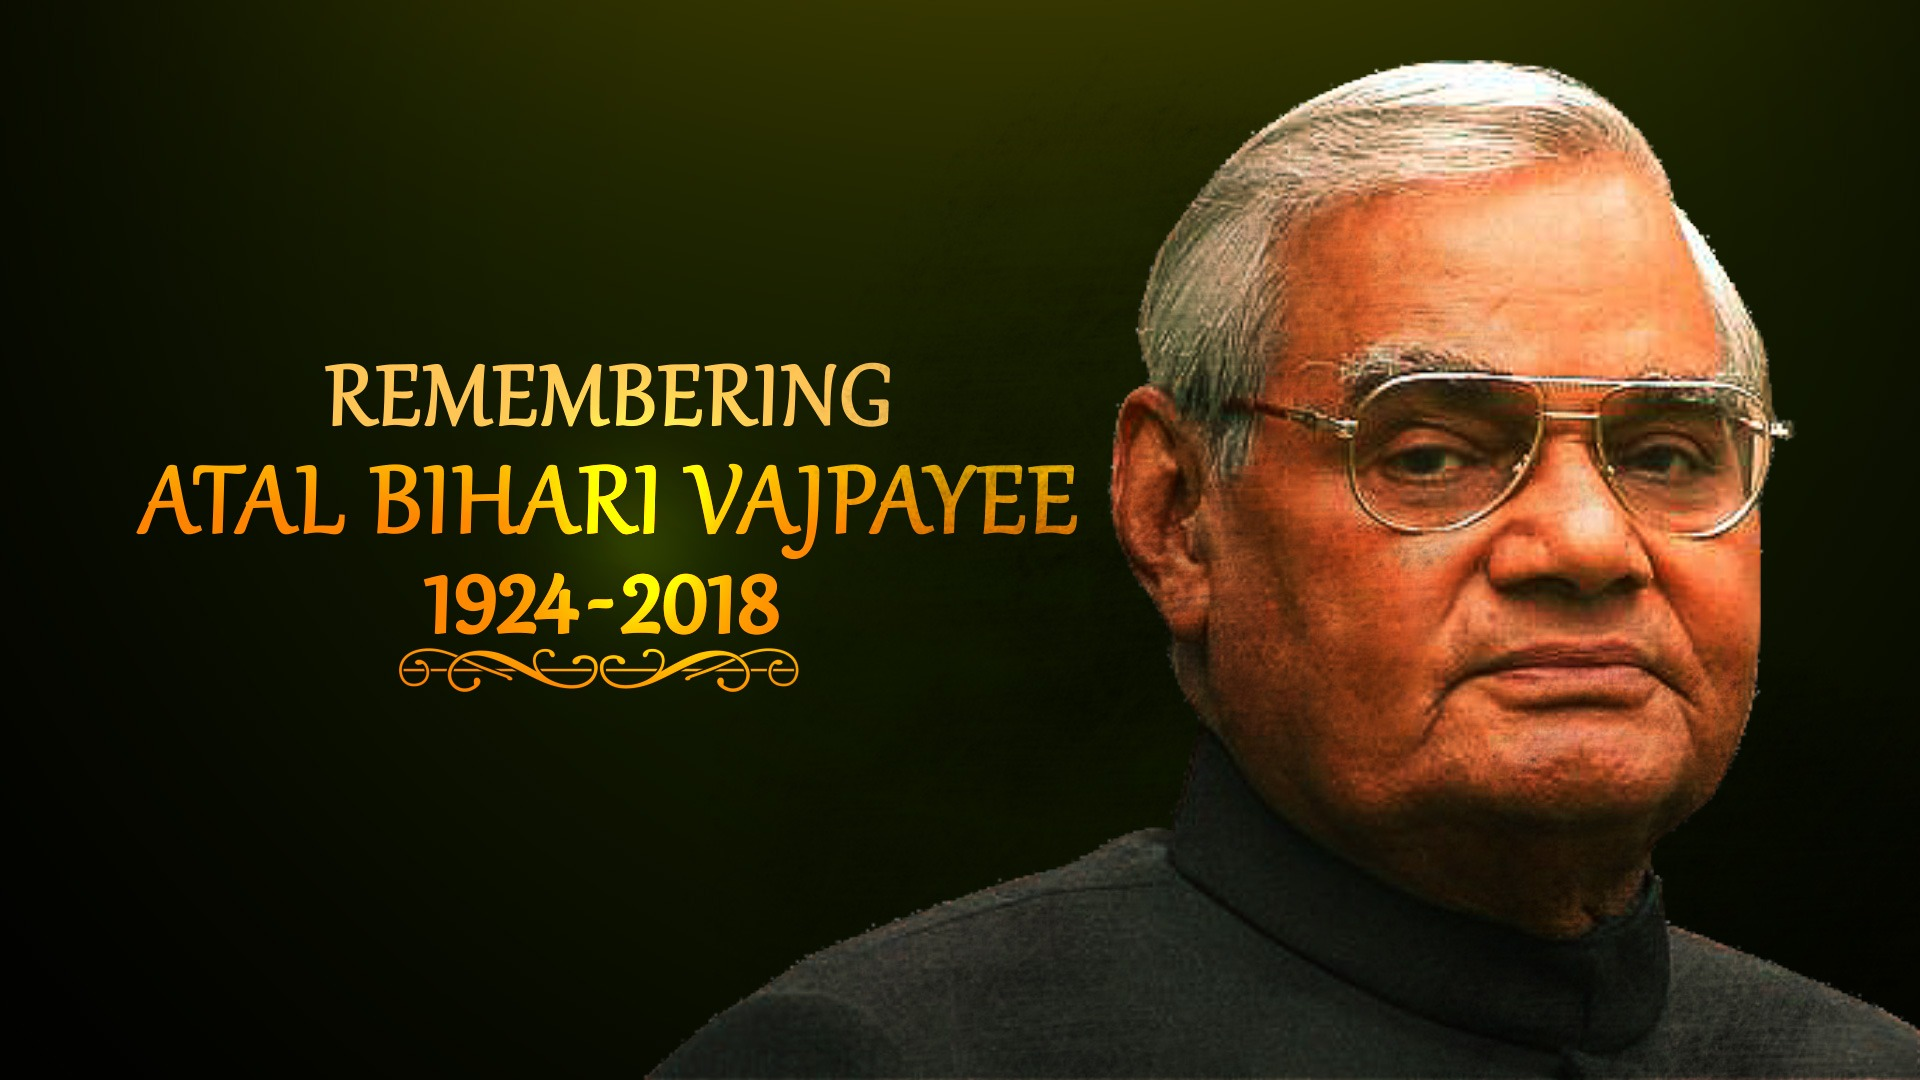 Atal-Bihari-Vajpayee-Remembered-On-His-First-Death-Anniversary